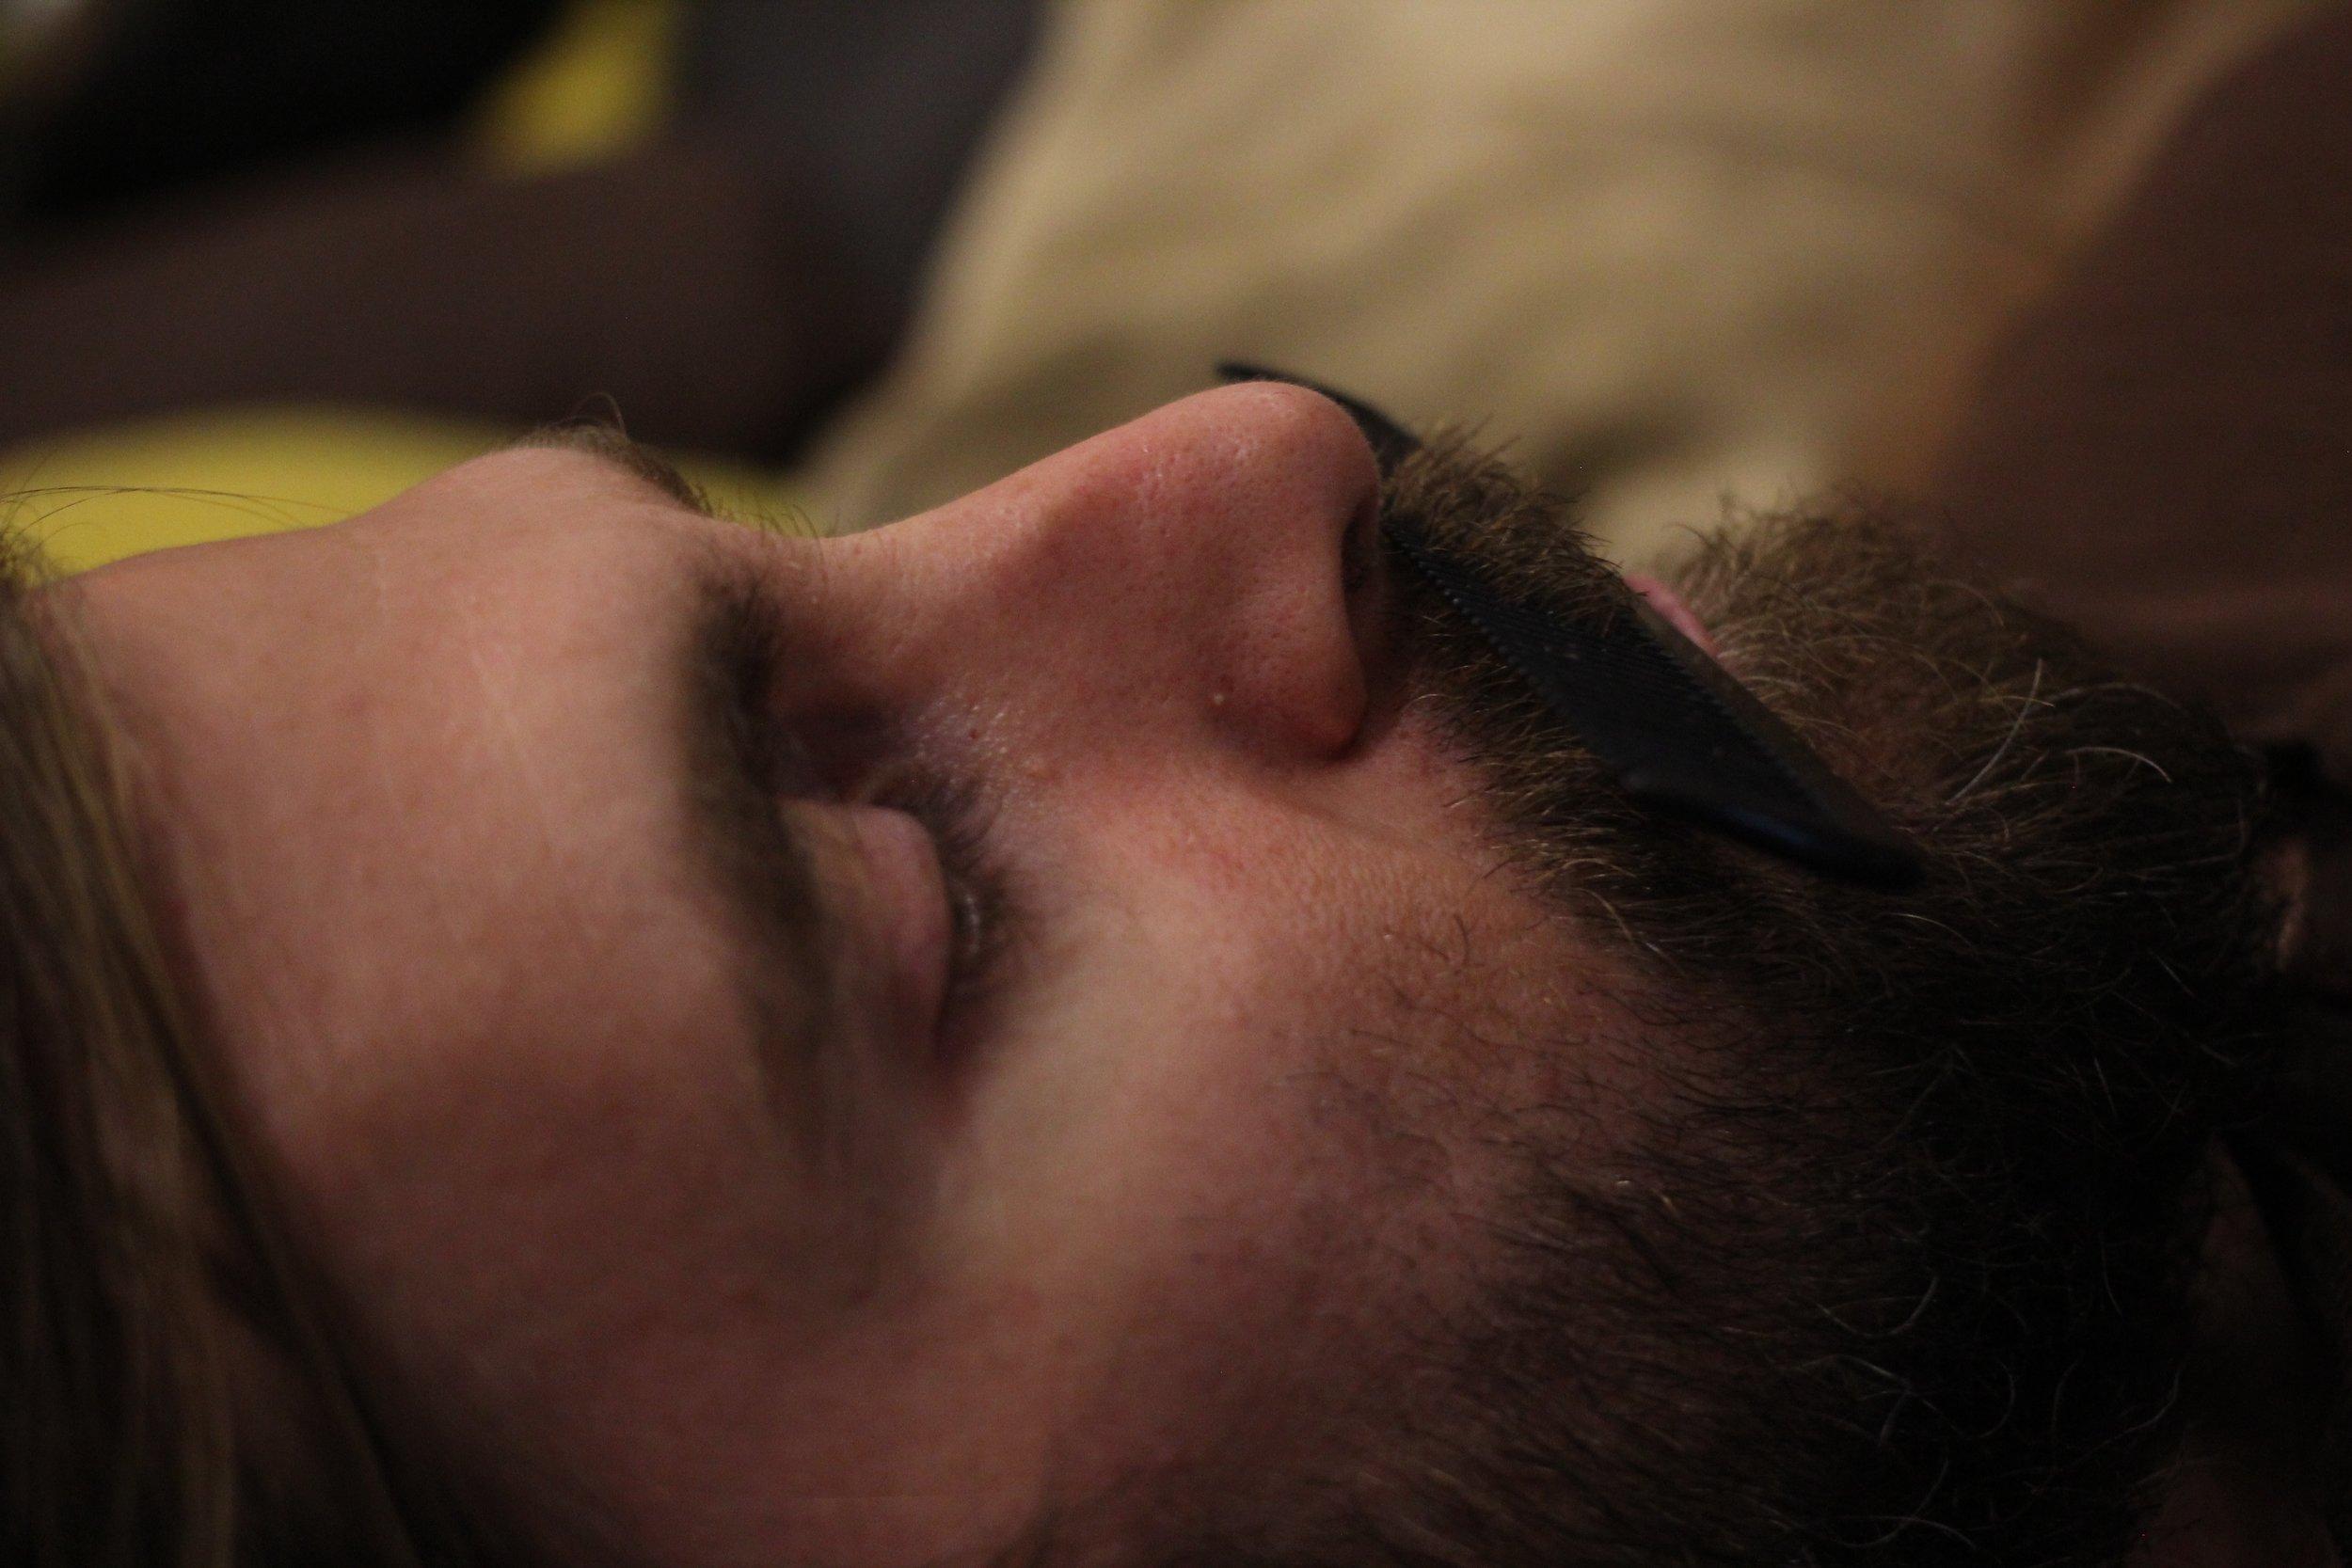 Gangster beard (taken in Jaipur at our hostel)